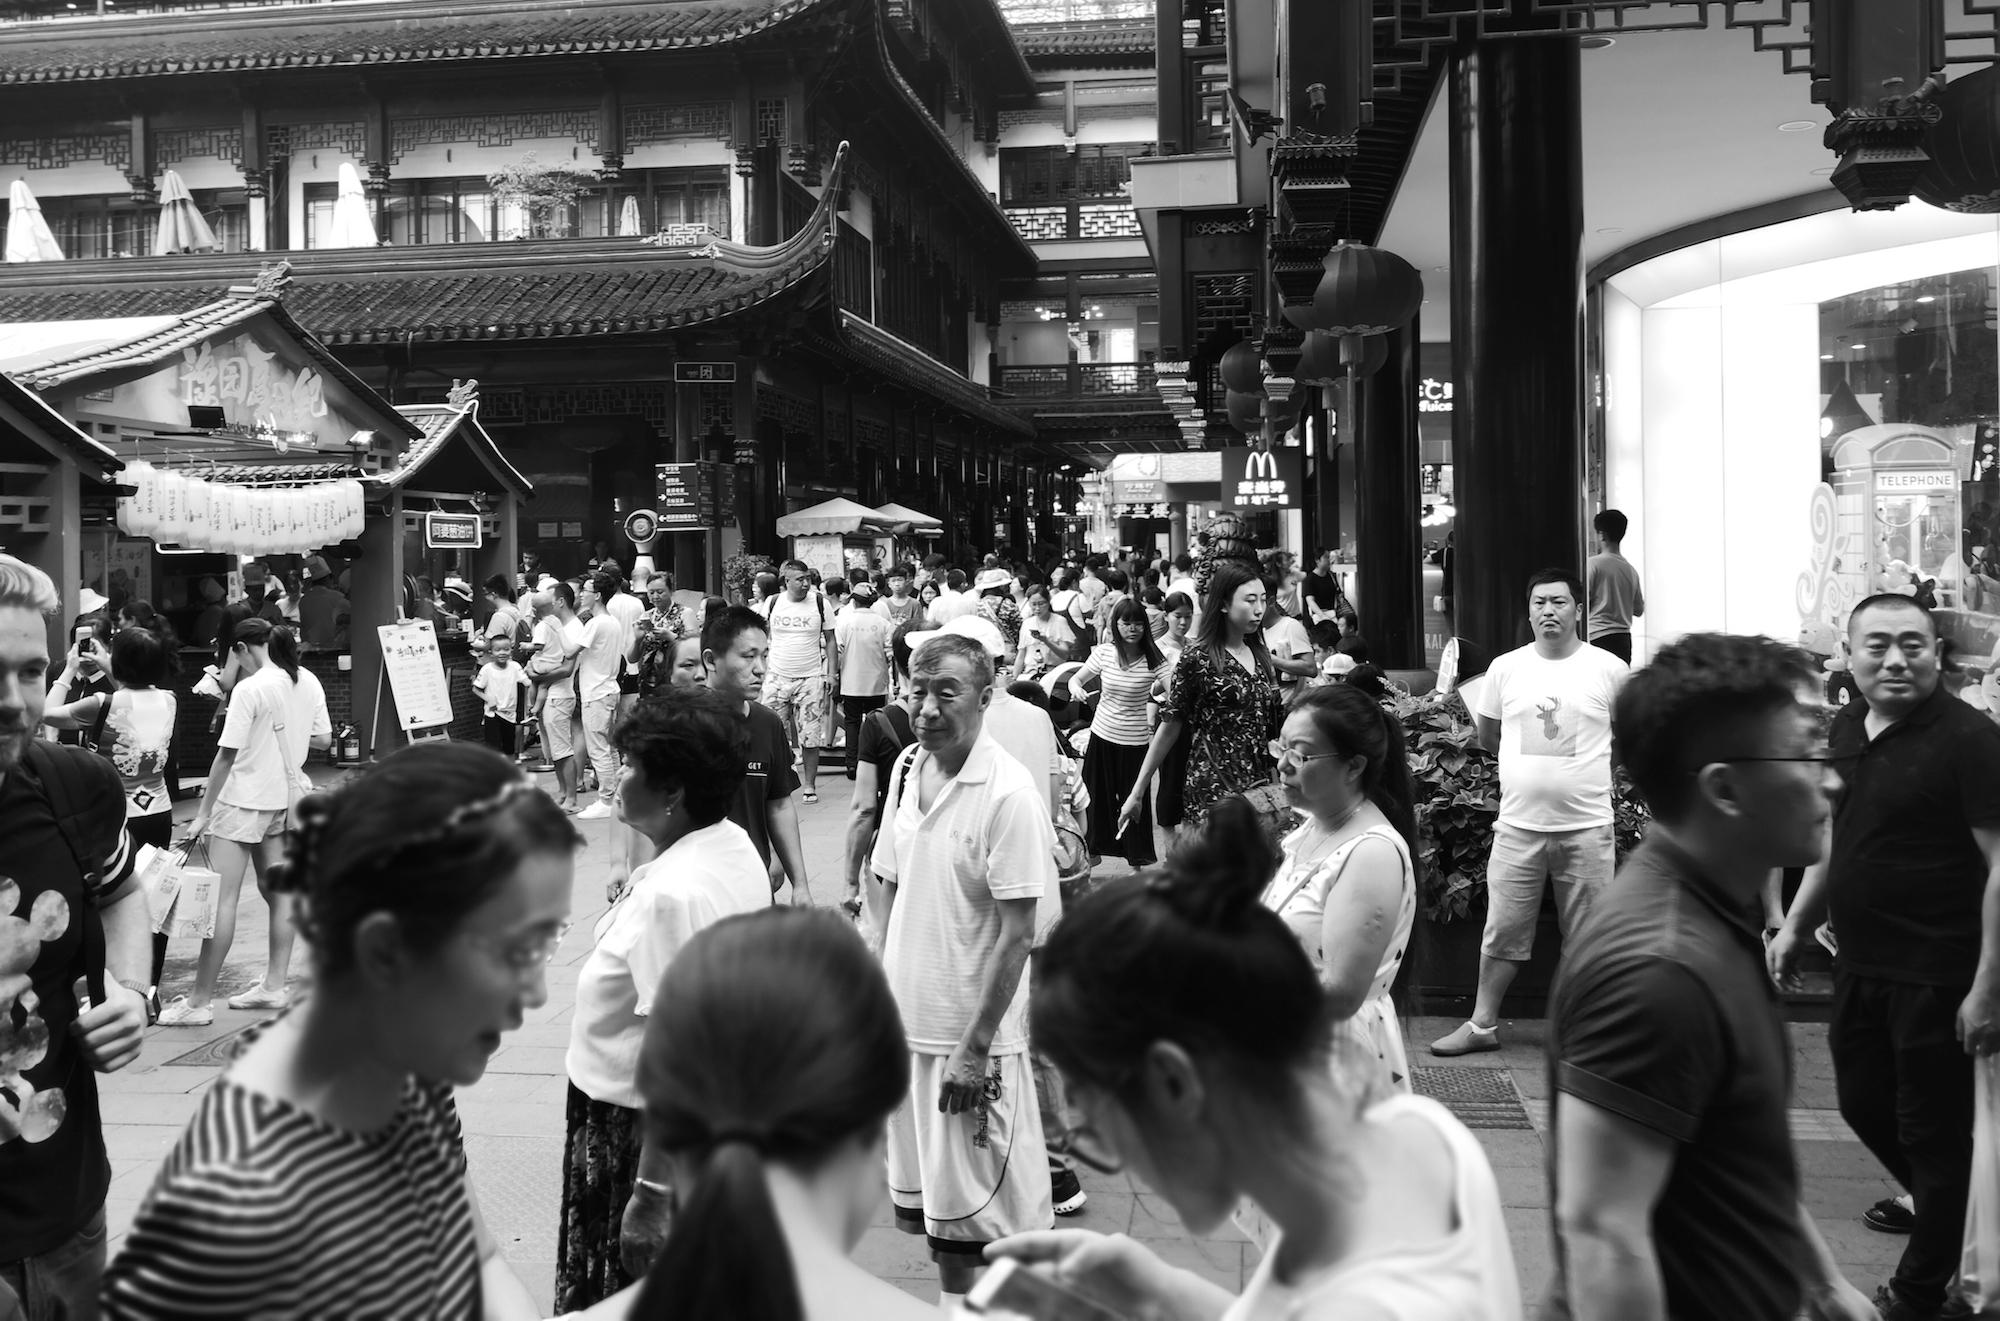 Bustling-Shanghai